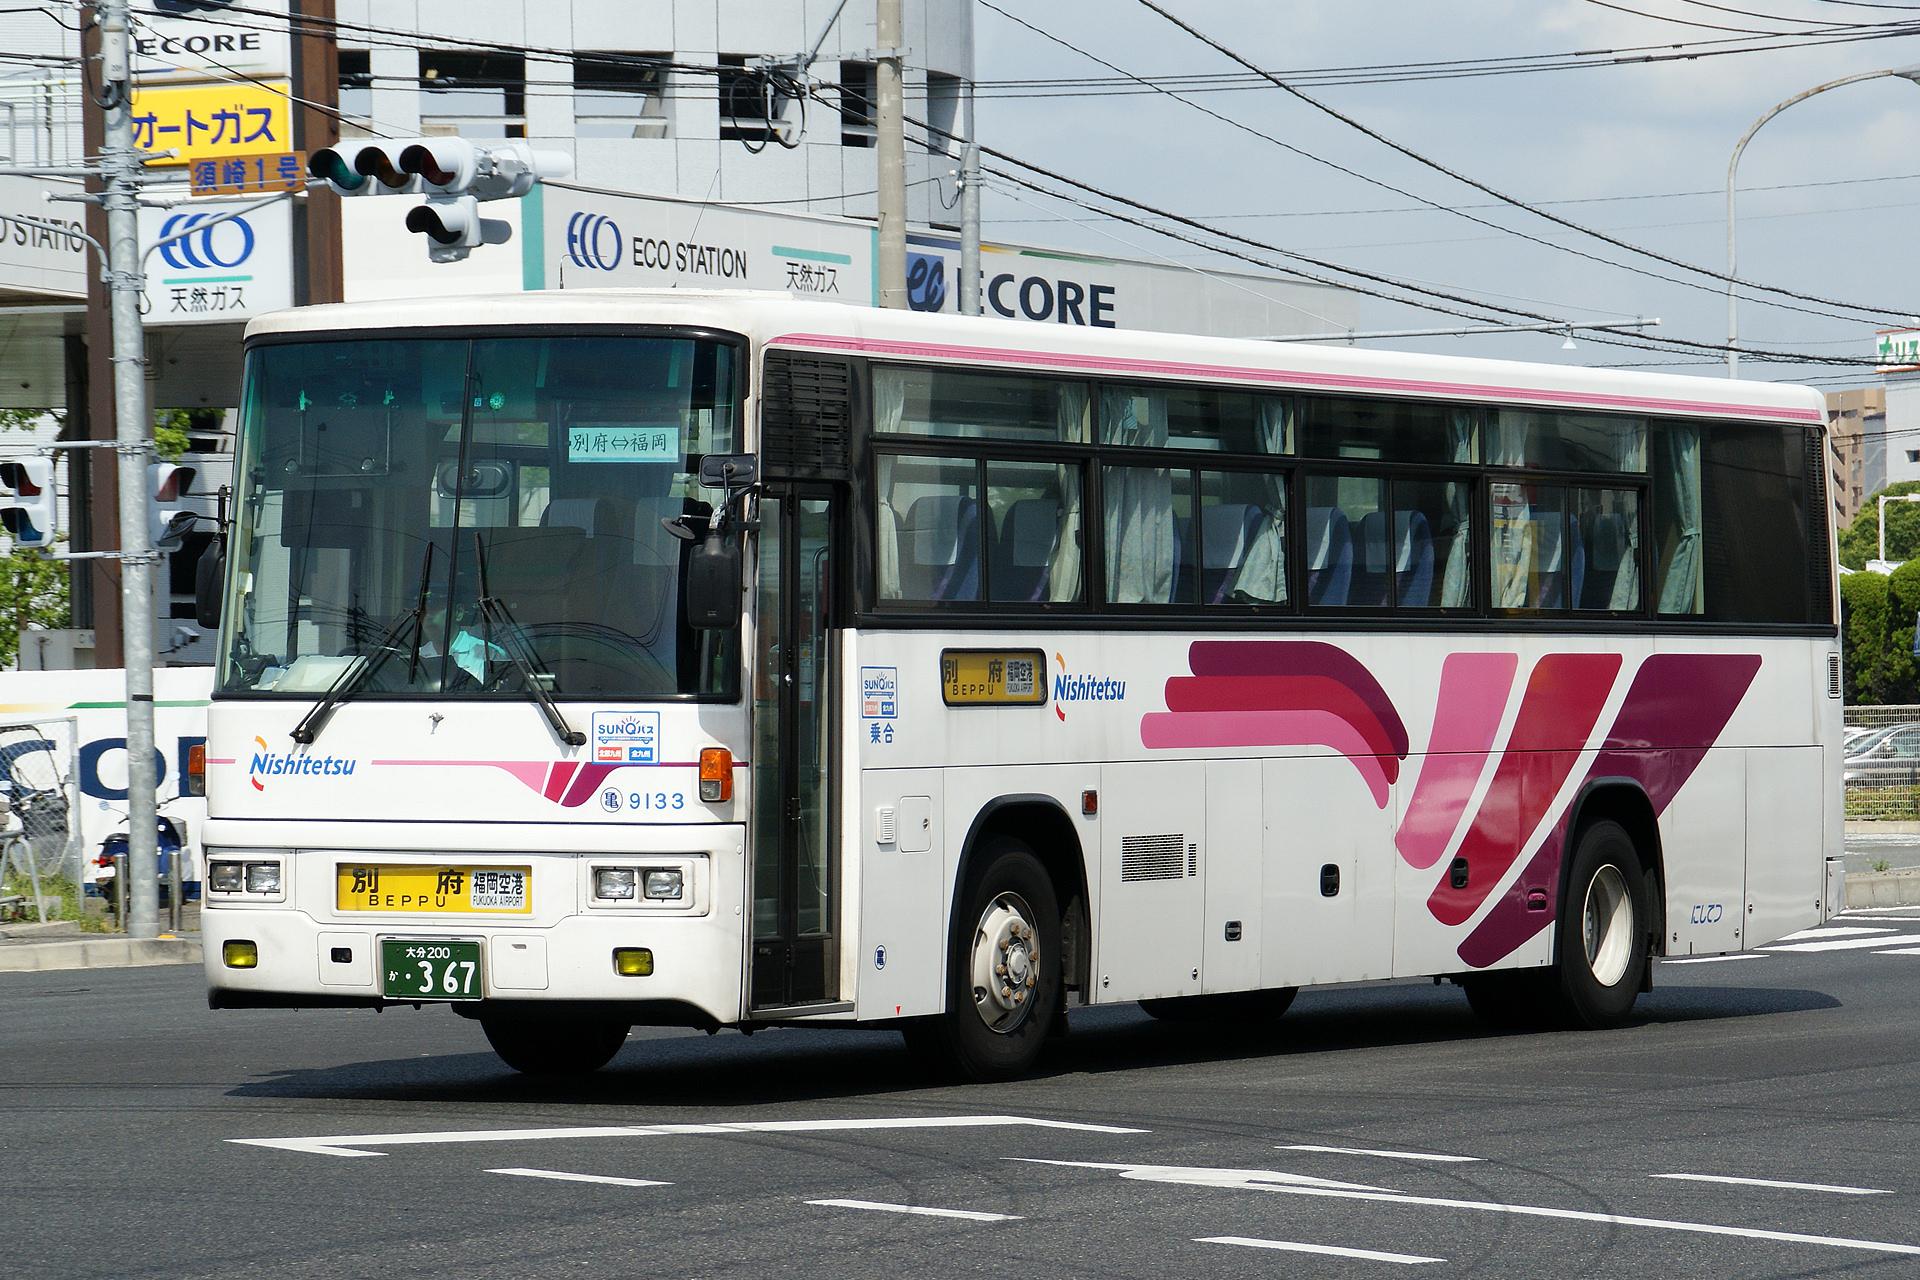 File:Nishi-Nippon Railroad - 9133.JPG